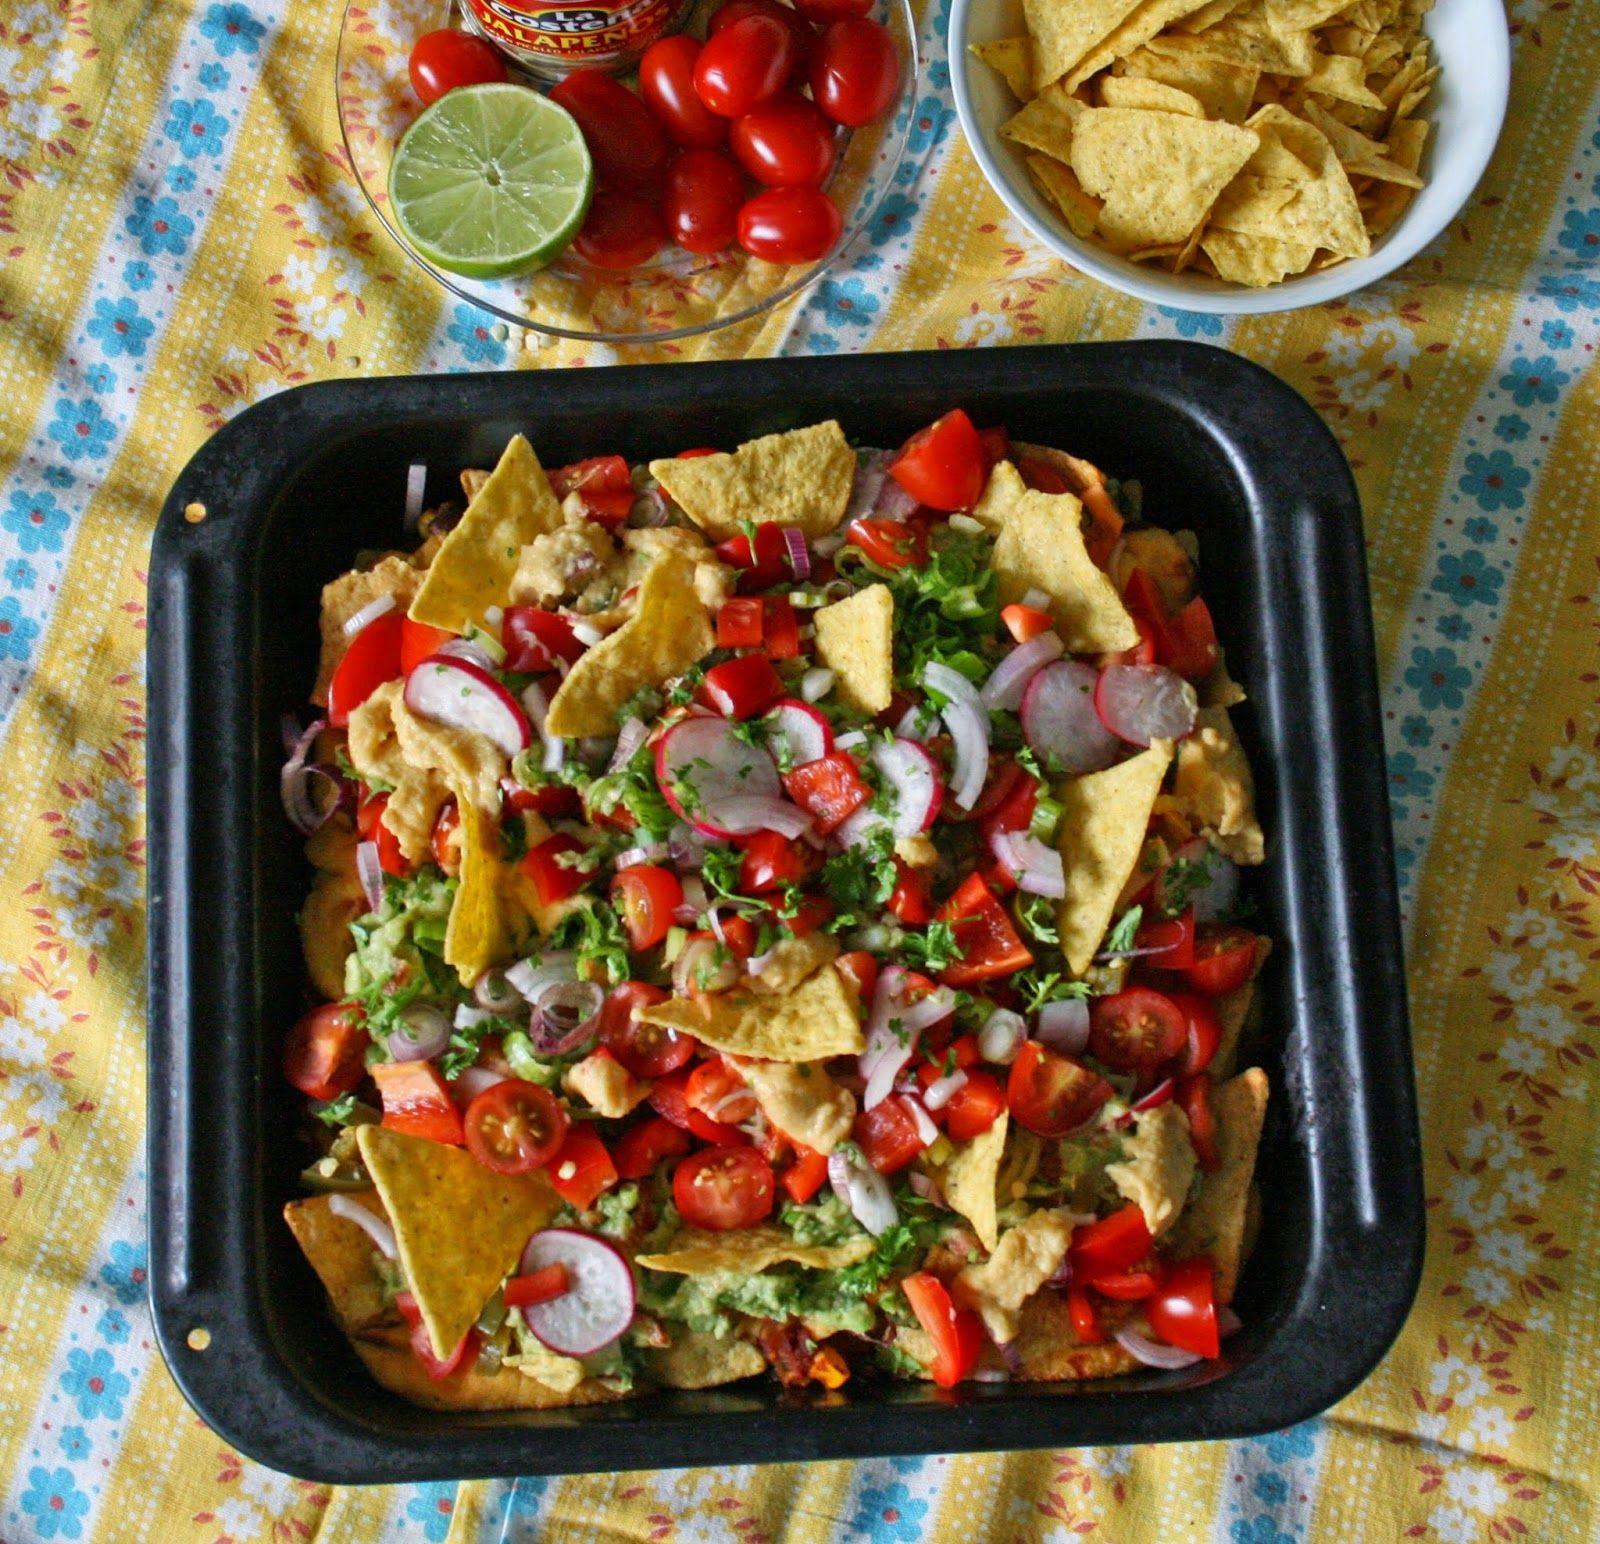 "Oven baked nachos with black beans, guacamole, fresh veggies and vegan nacho ""cheese"" sauce. Vegan, gluten free - by Maikin mokomin"